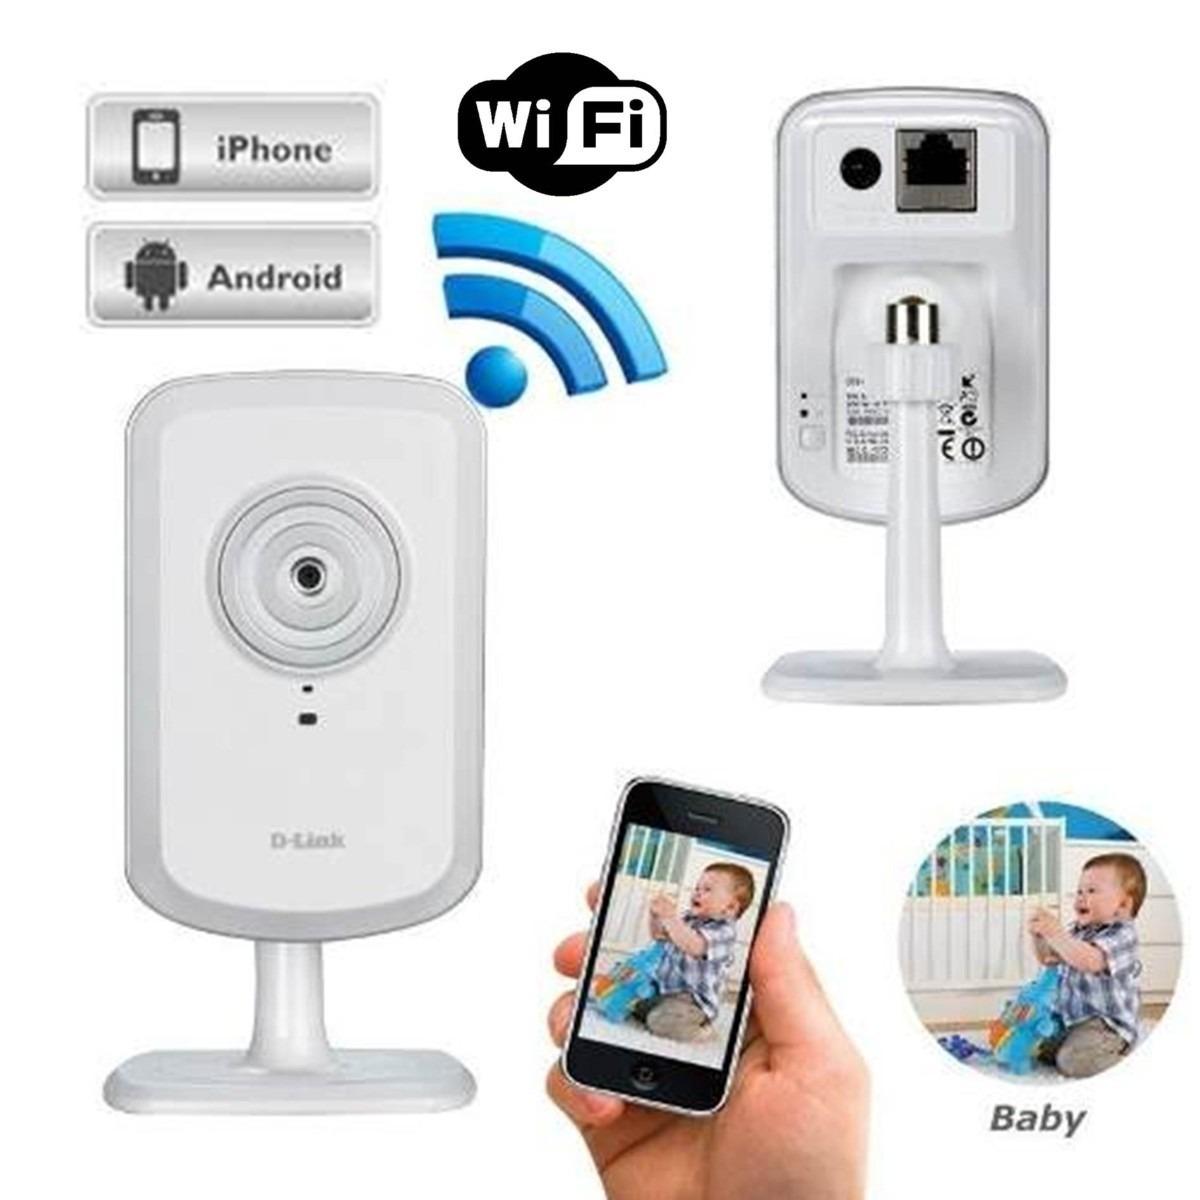 Camara seguridad ip dlink dcs 930l mic wifi rj45 660 - Camara de seguridad ip ...